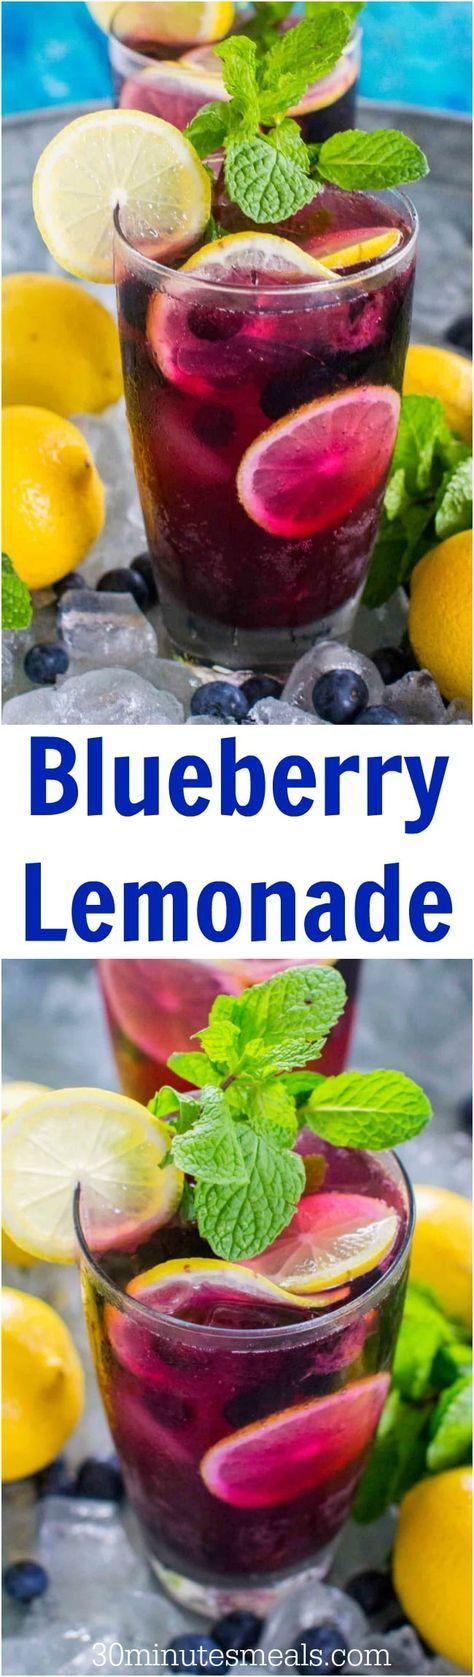 Sweet and refreshing Blueberry Lemonade tastes delicious and refreshing year round. Made easy with sweet blueberry simple syrup and fresh lemon juice. #lemonade #blueberry